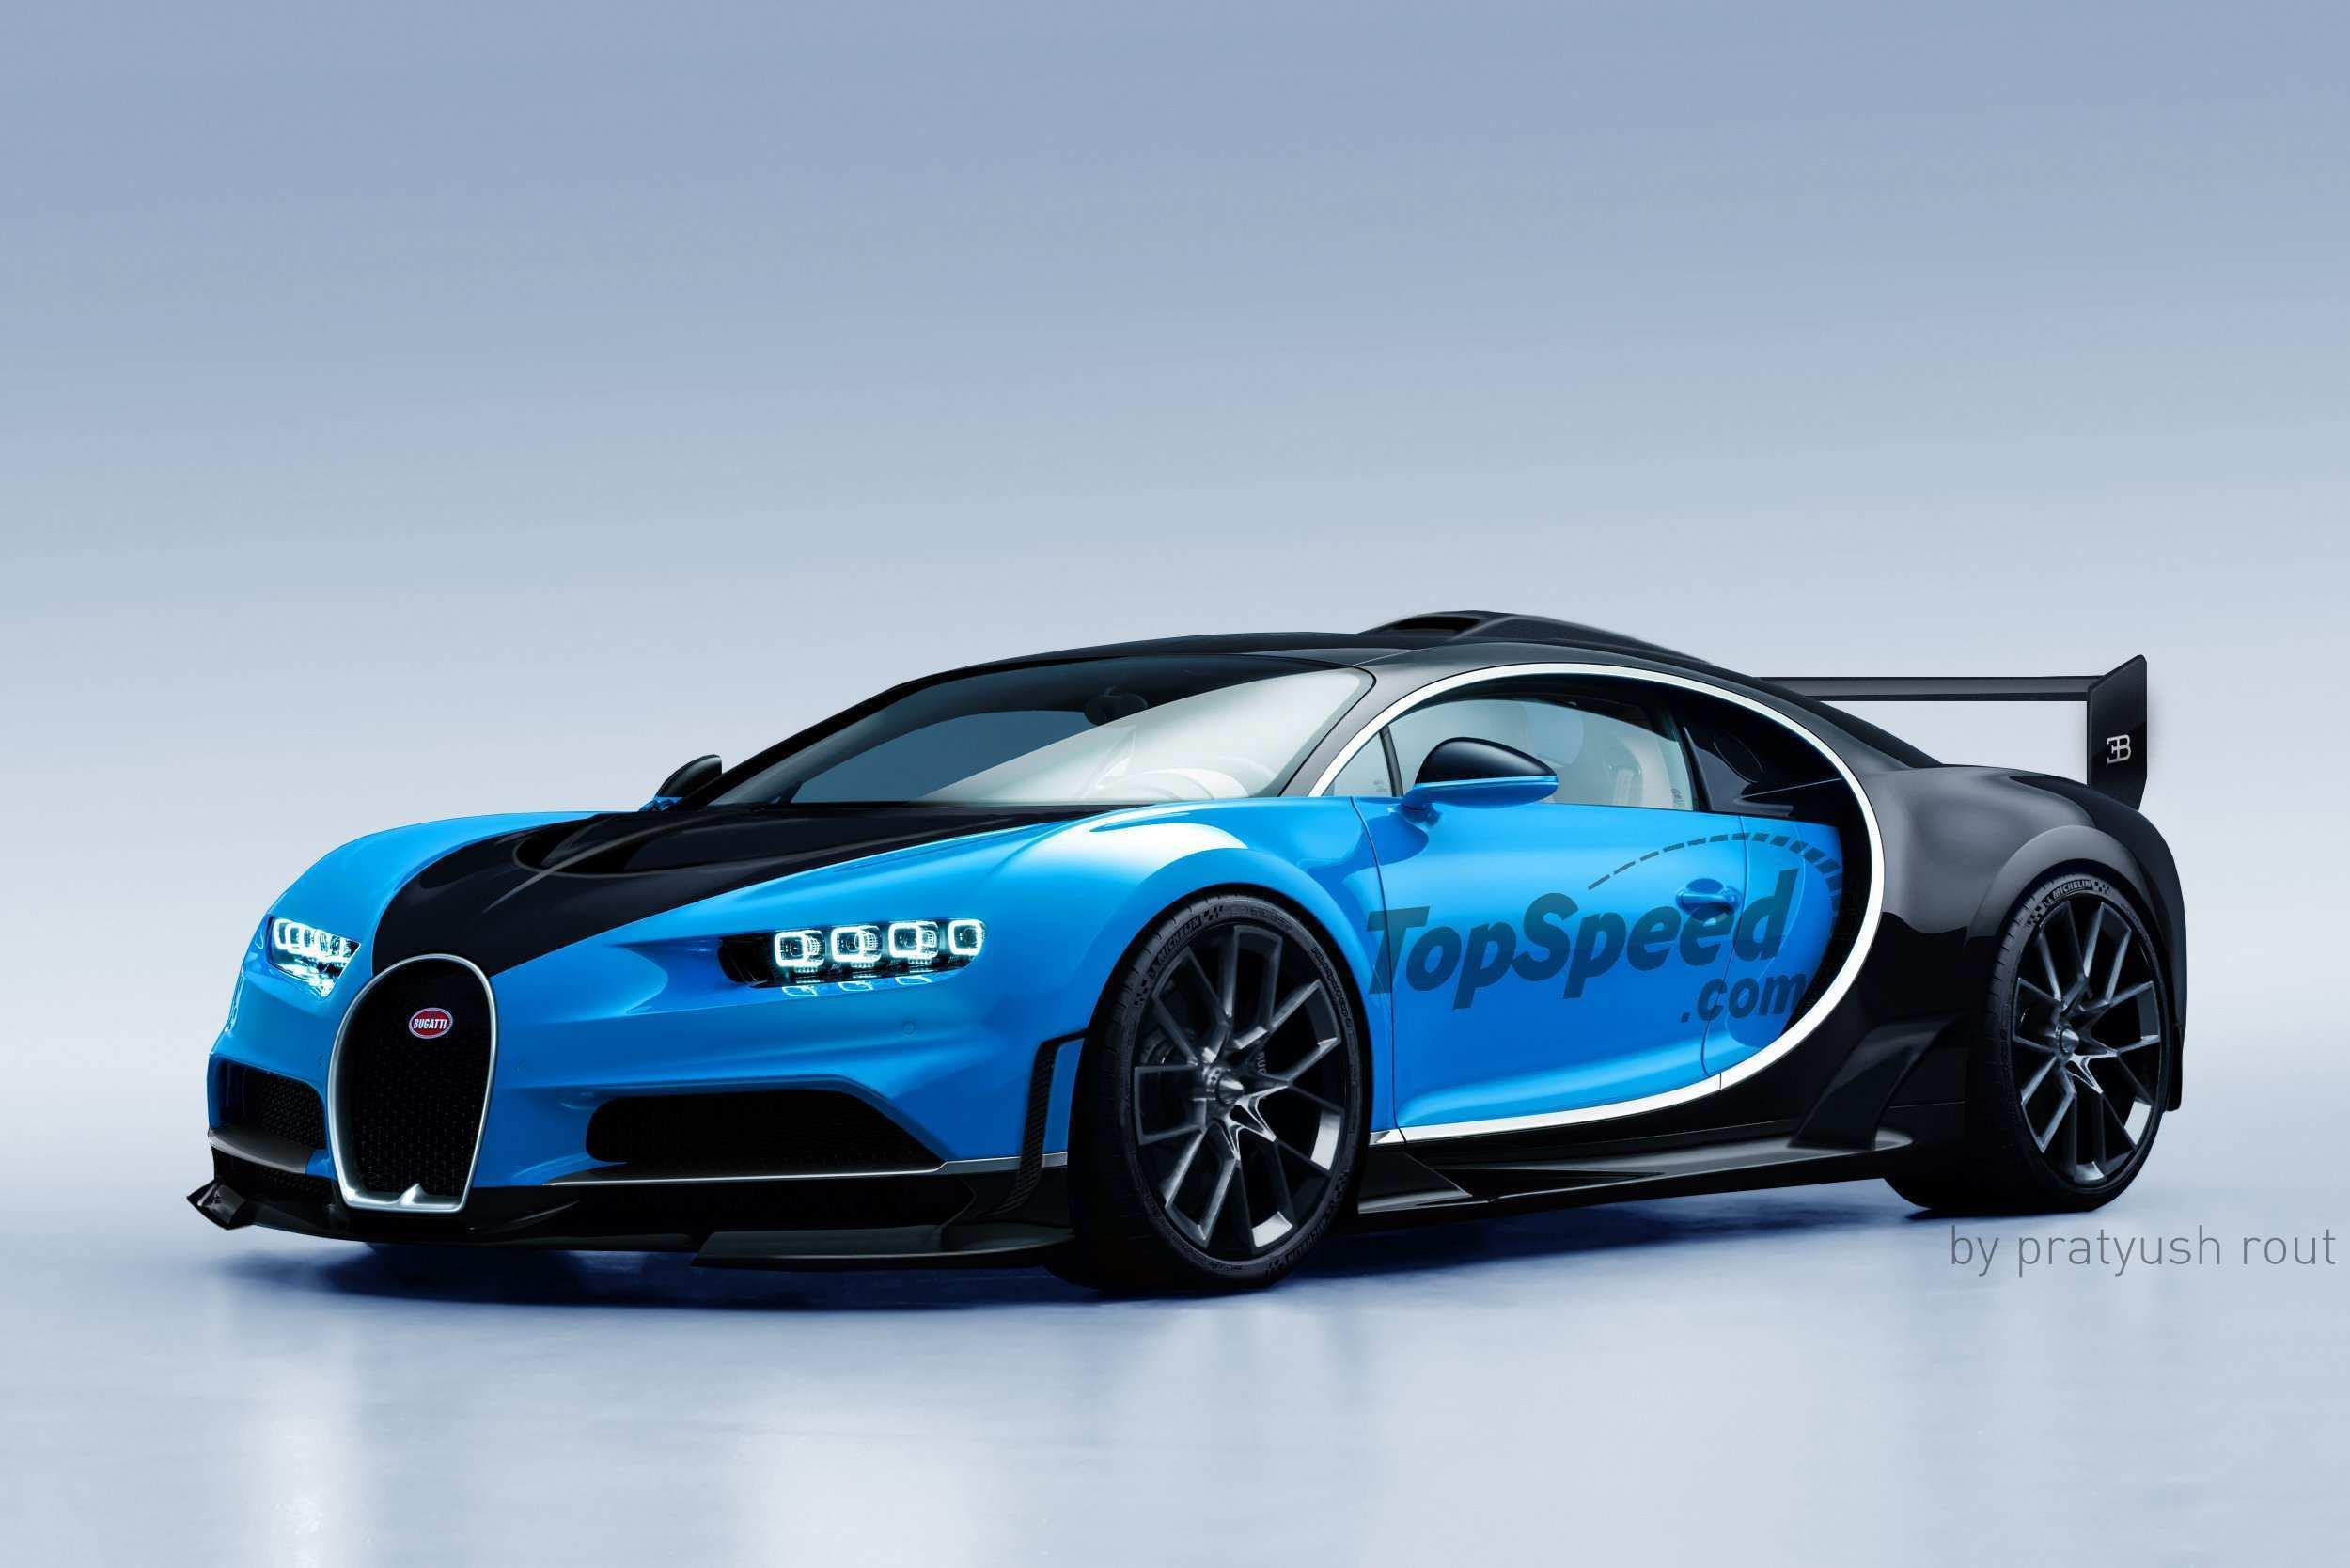 49 All New 2020 Bugatti Veyron Wallpaper with 2020 Bugatti Veyron